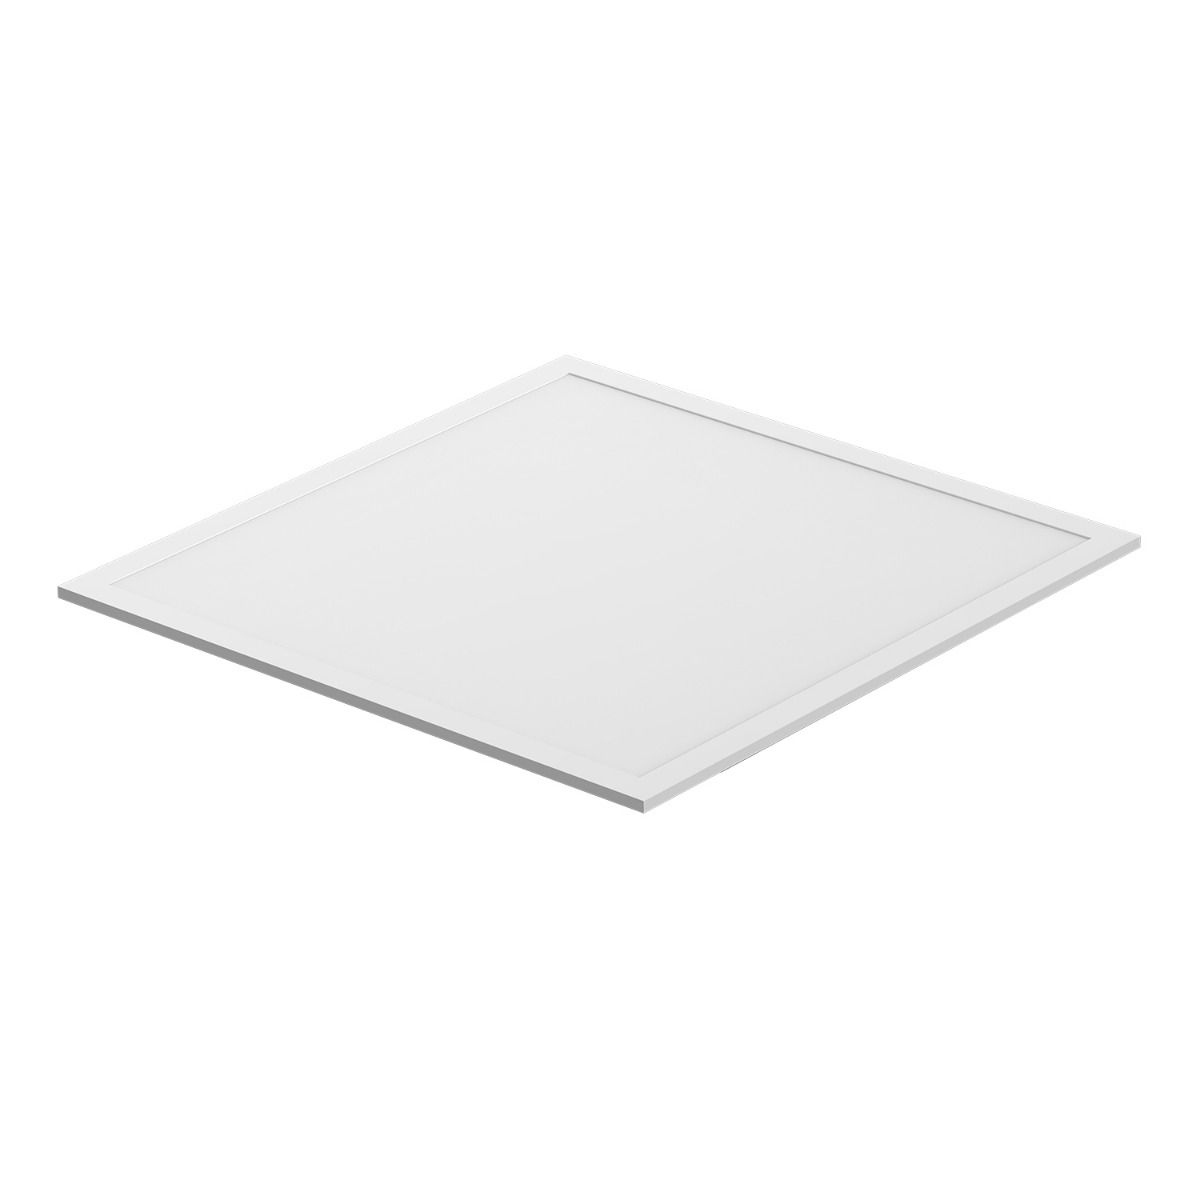 Noxion LED Panel Delta Pro Highlum V2.0 Xitanium DALI 40W 60x60cm 3000K 5280lm UGR <19   Dali Dimbar - Varm Vit - Ersättare 4x18W